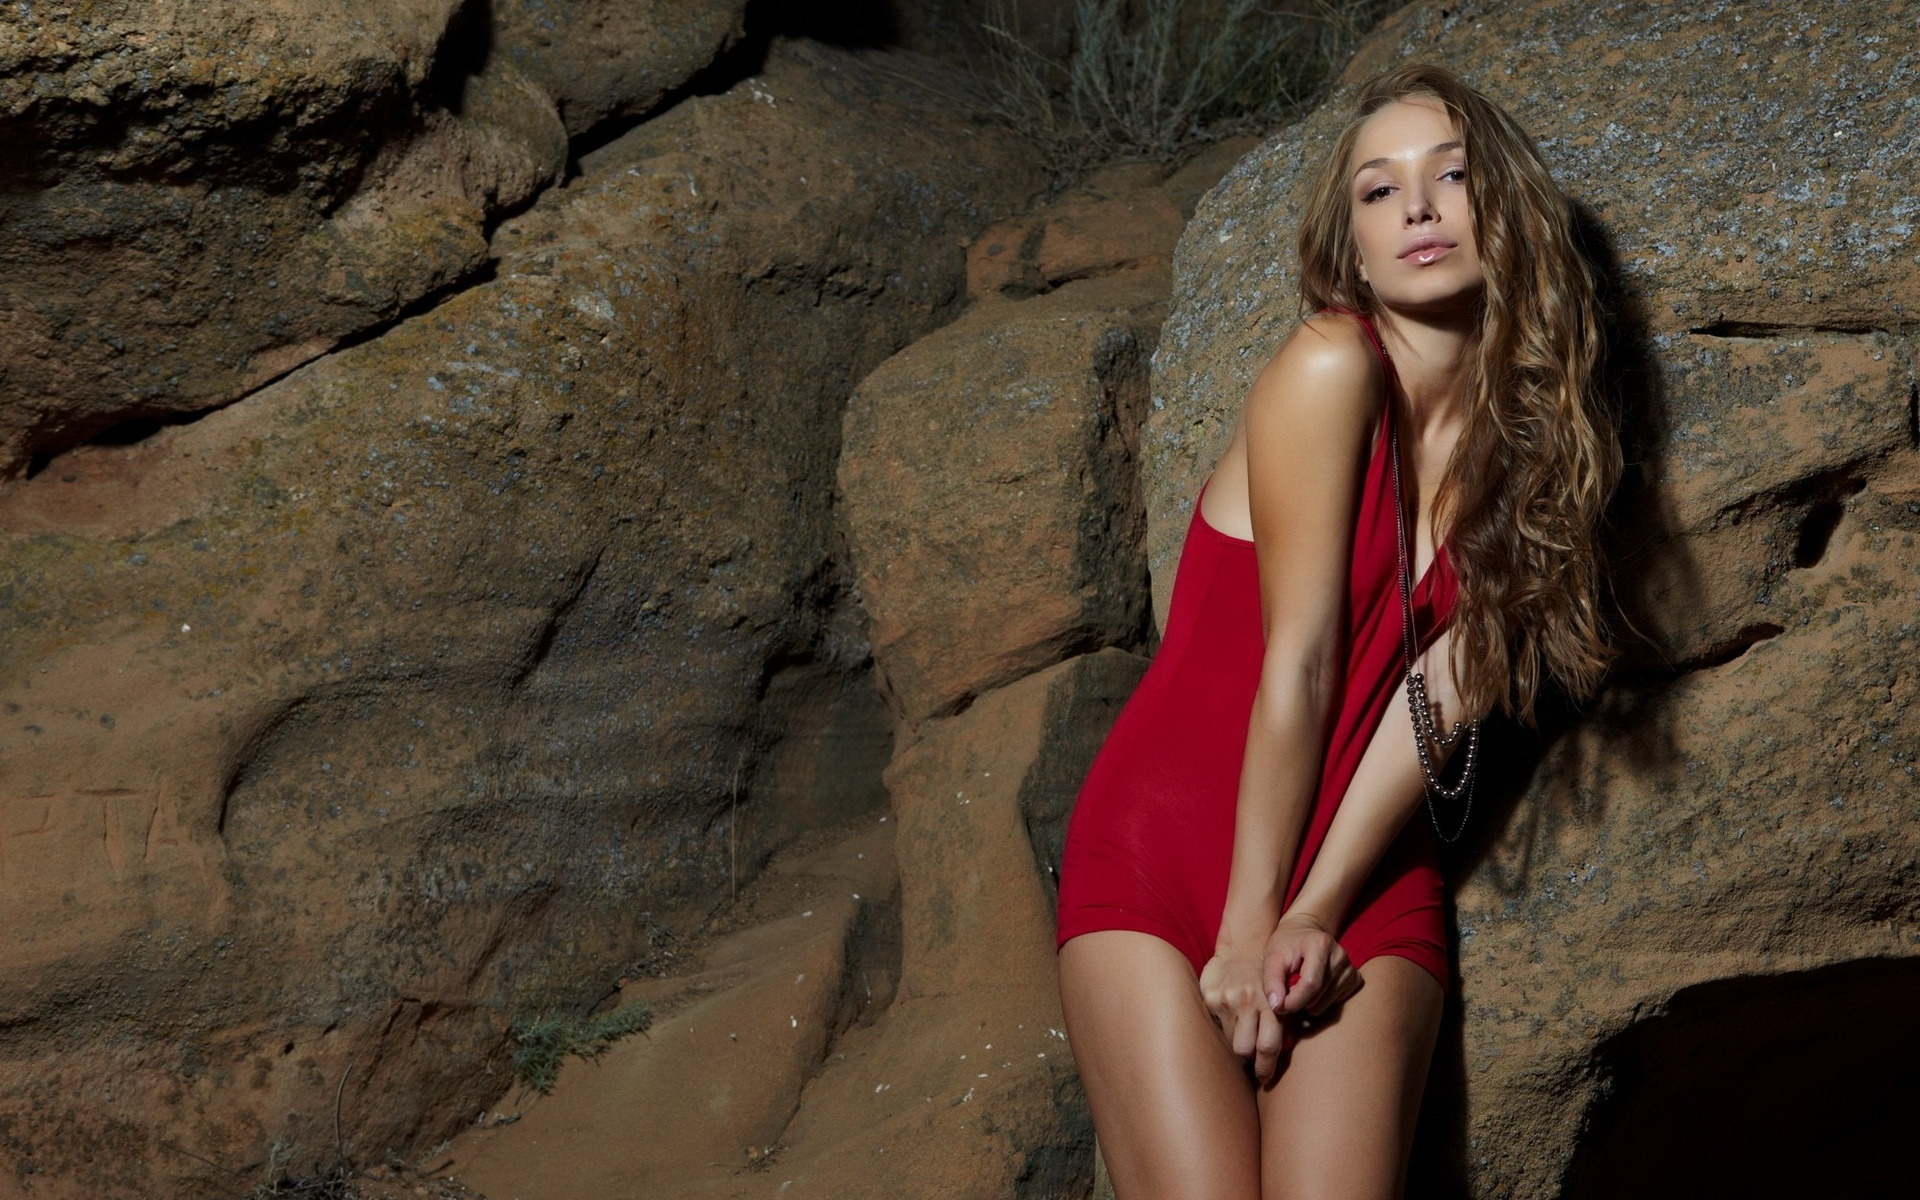 Swimsuit Models Wallpaper